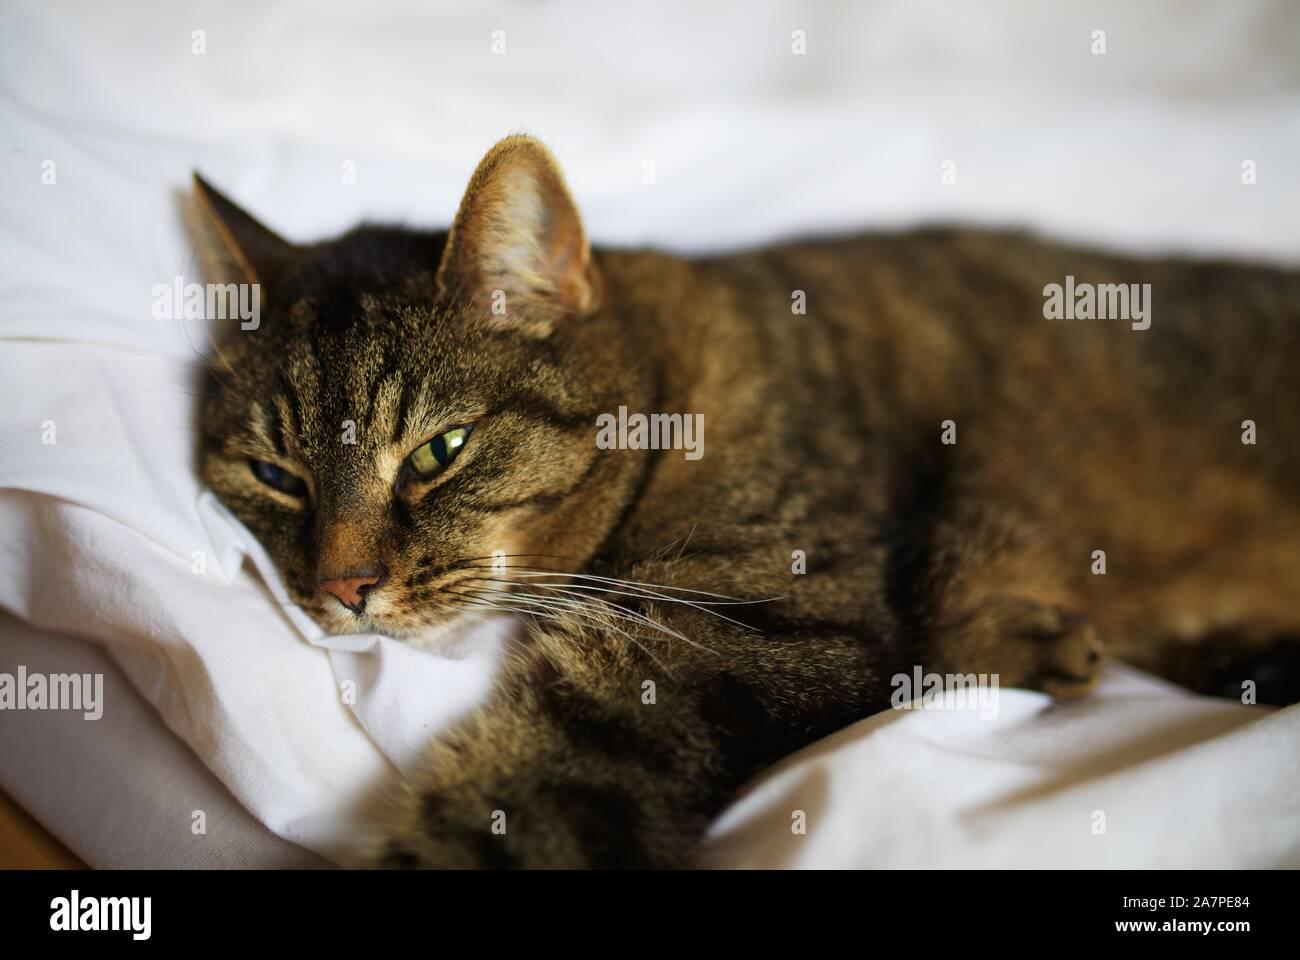 cat-2A7PE84.jpg